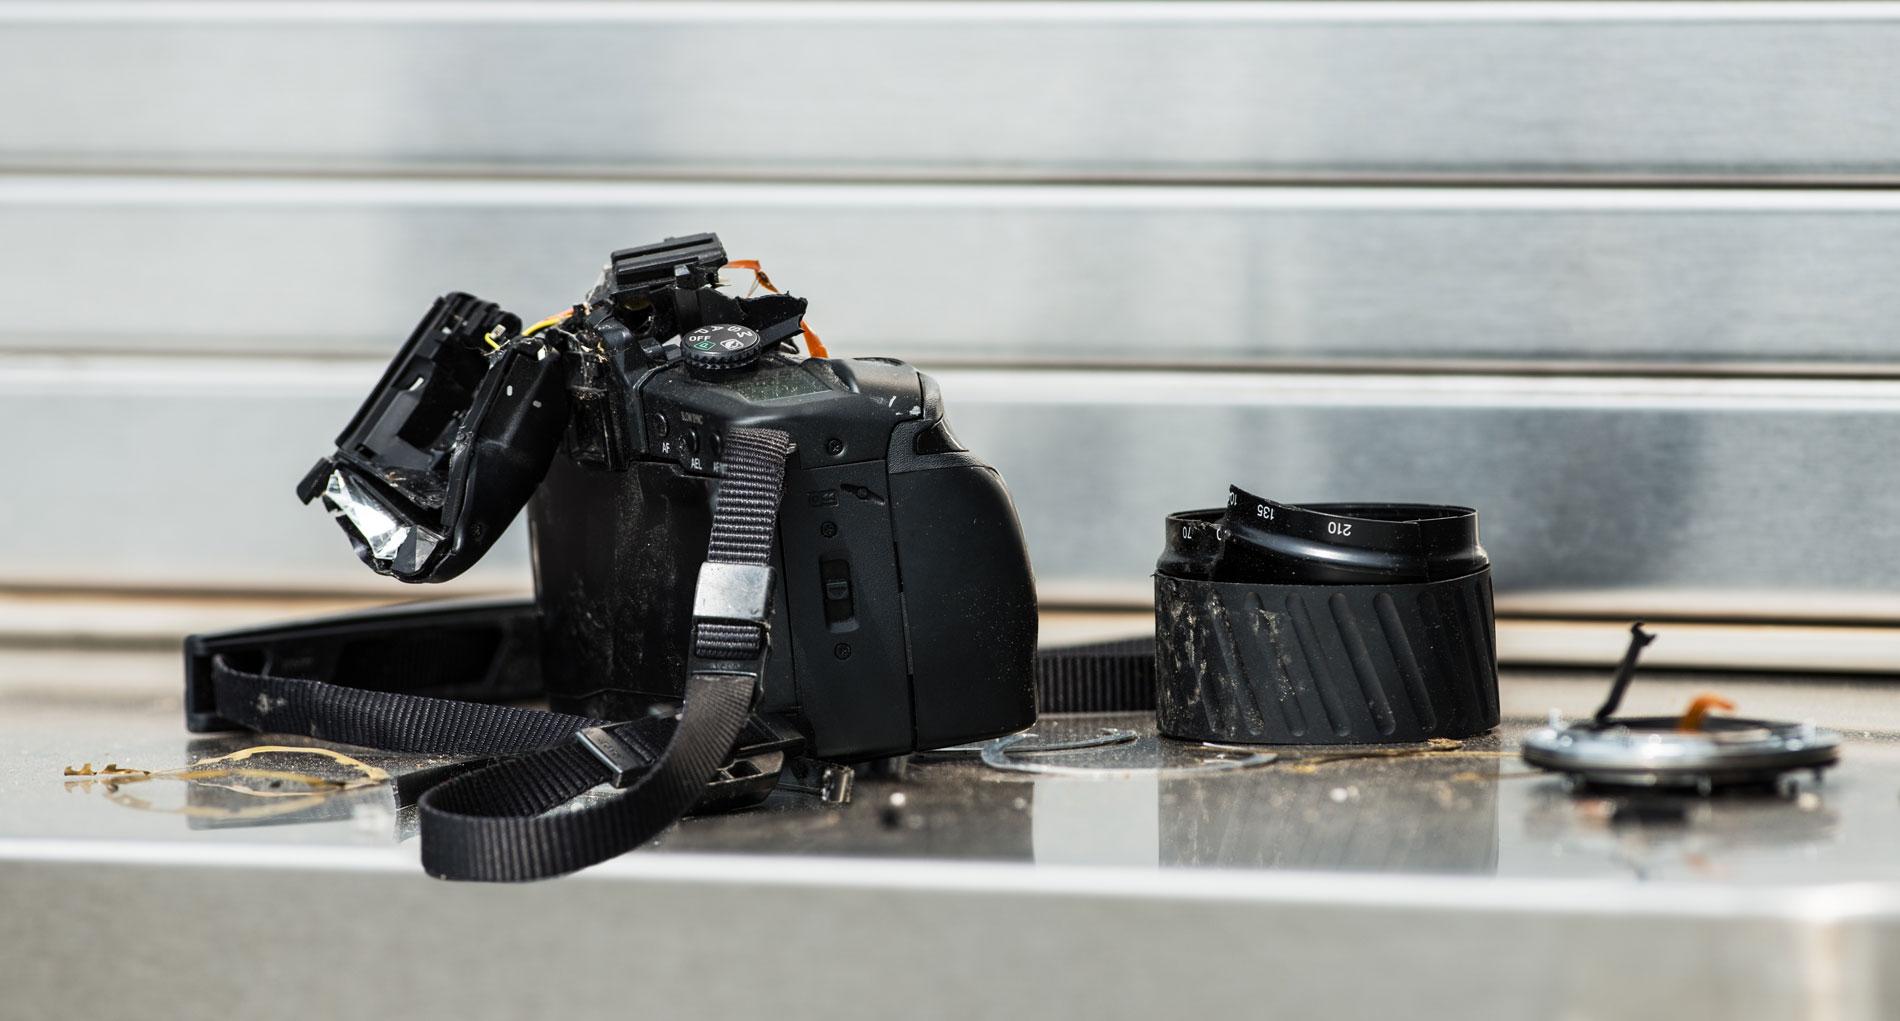 damanged camera